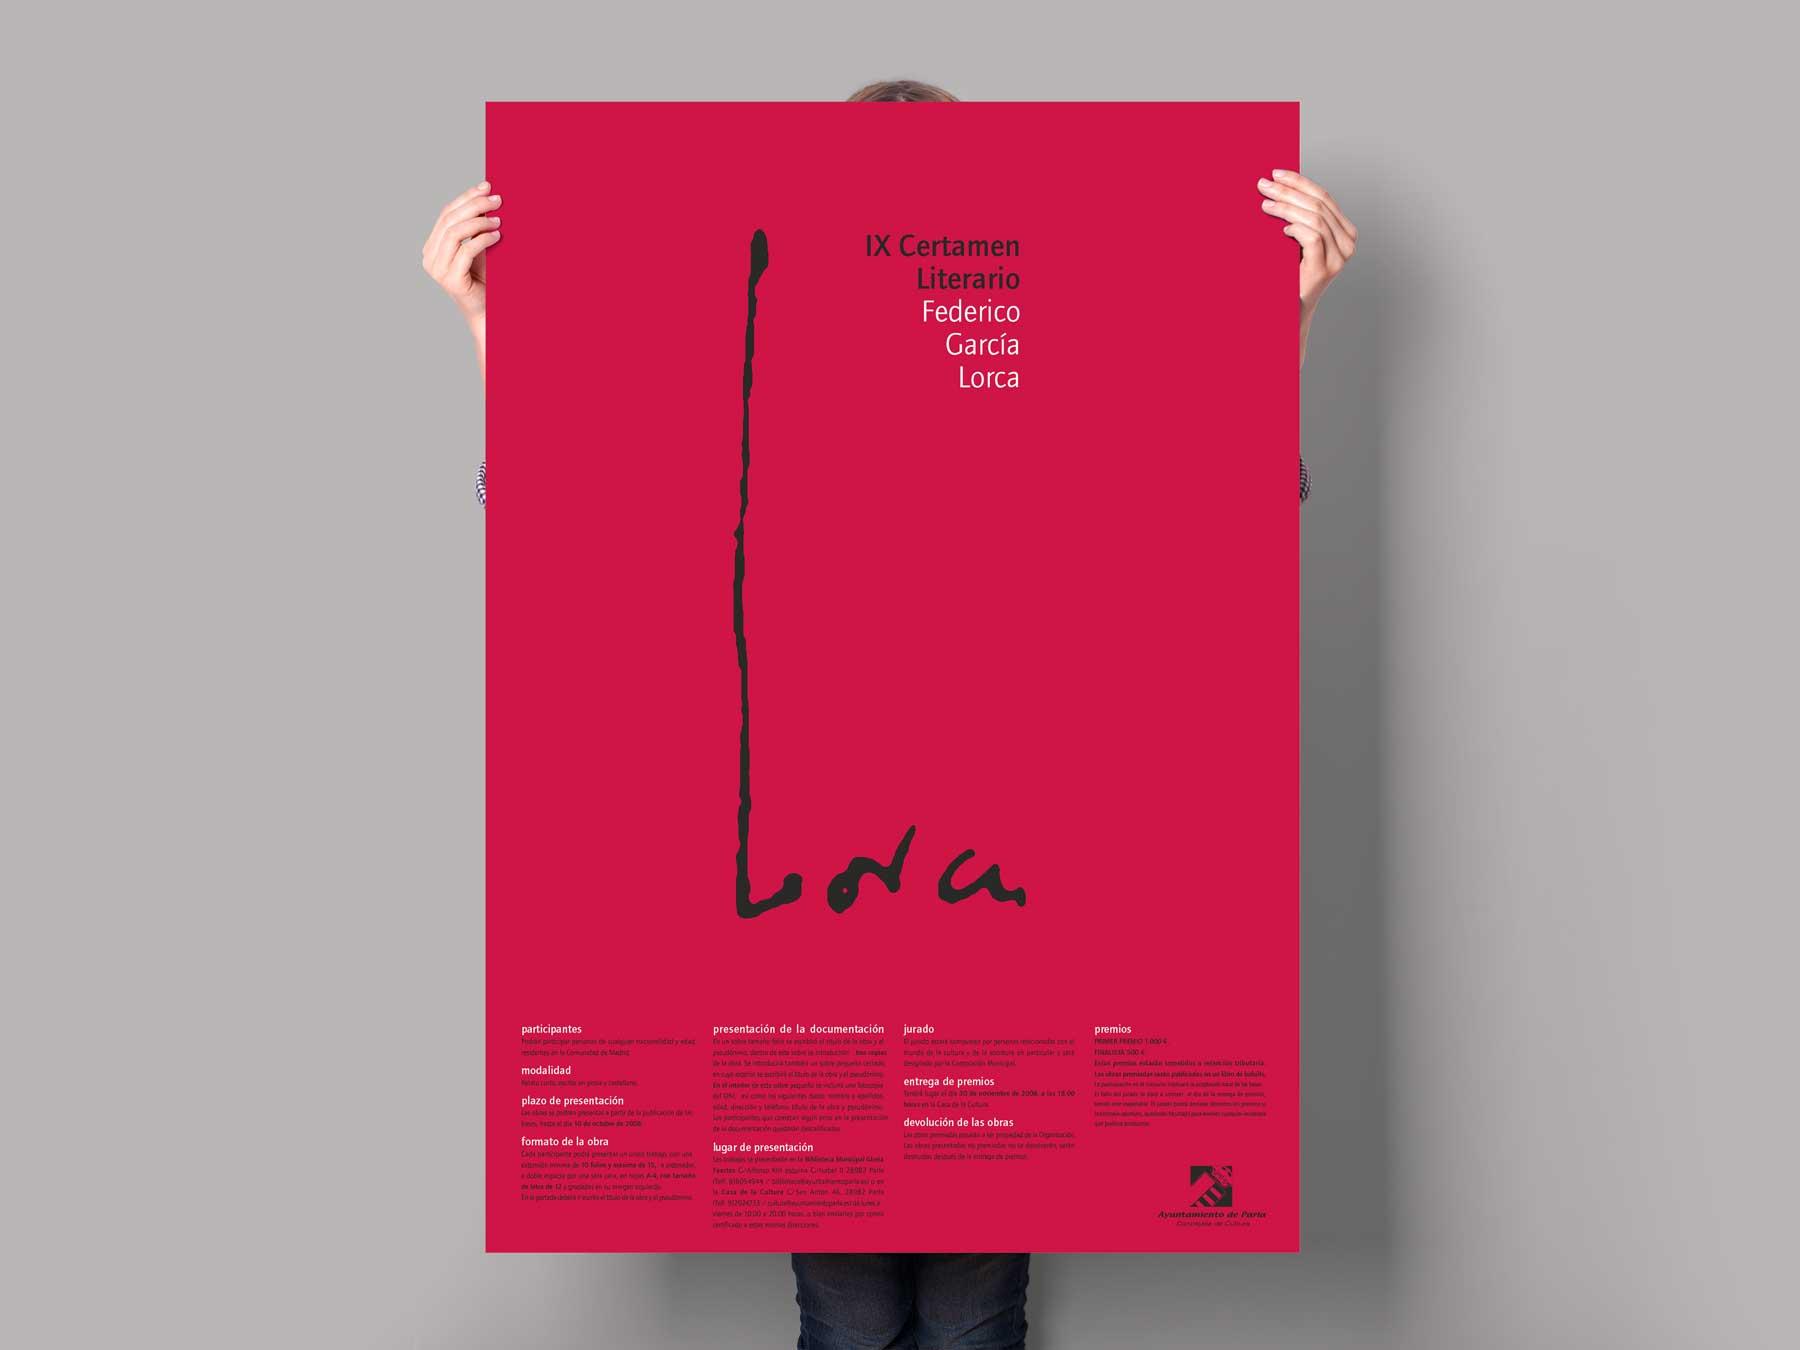 lorca_07